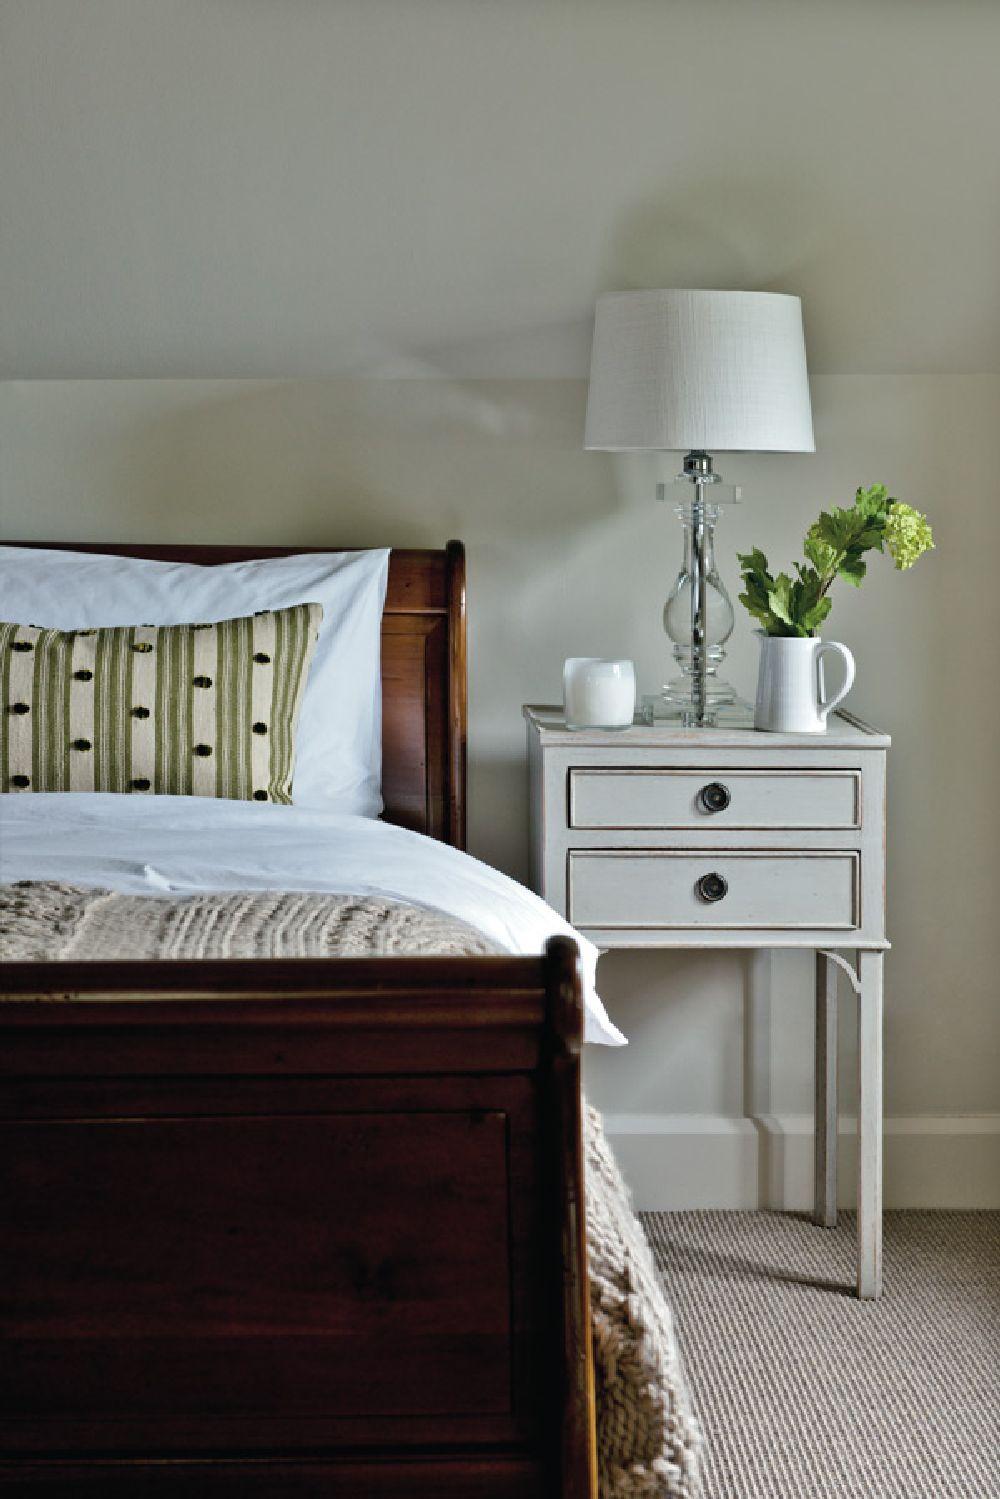 adelaparvu.com despre casa veche Anglia decorata in pasteluri, Design Interior Sims Hilditch Interior Design, Dorset Manor House, Foto Polly Eltes (1)